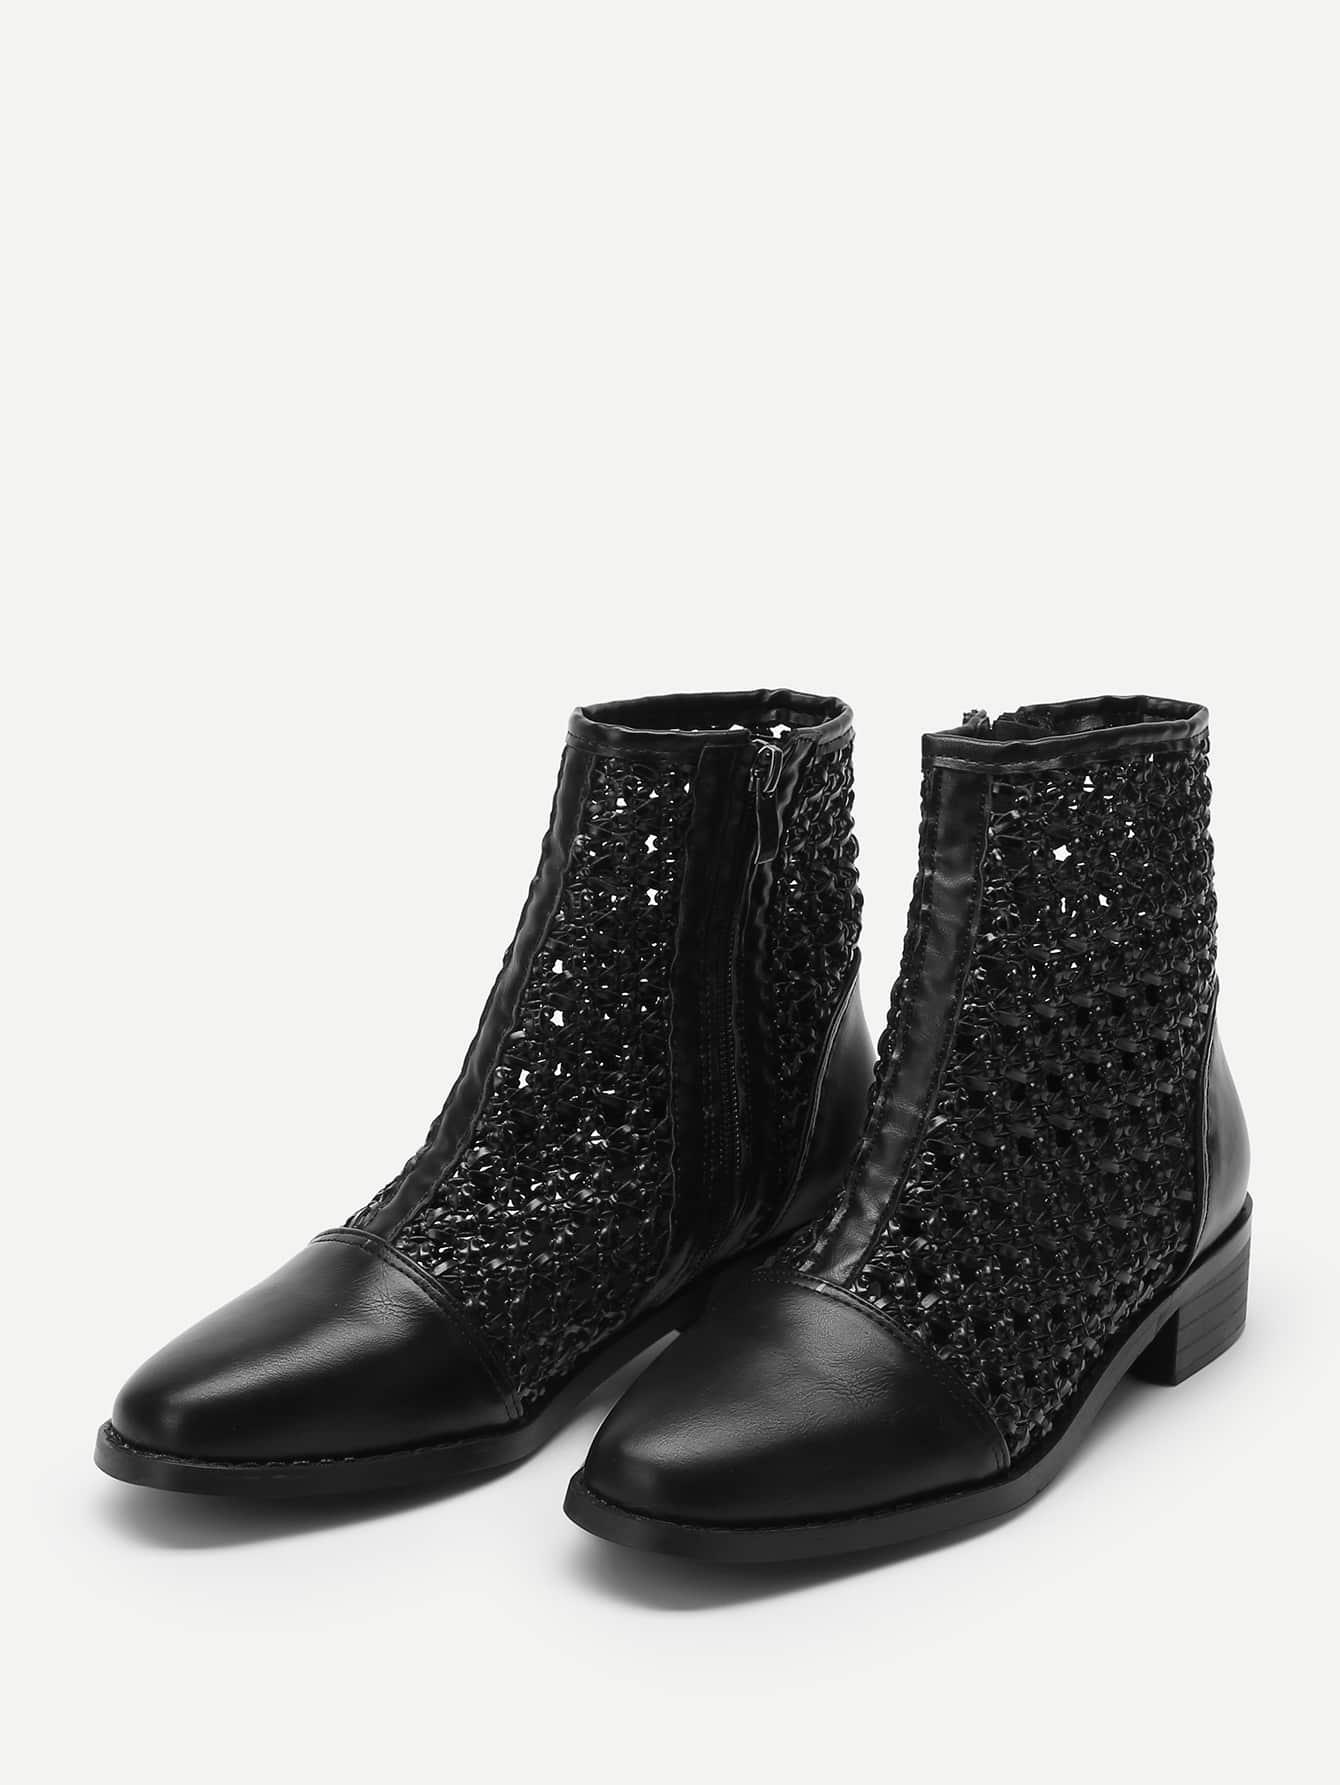 857e23b6b21 Cut-out Cap Toe Ankle Boots EmmaCloth-Women Fast Fashion Online